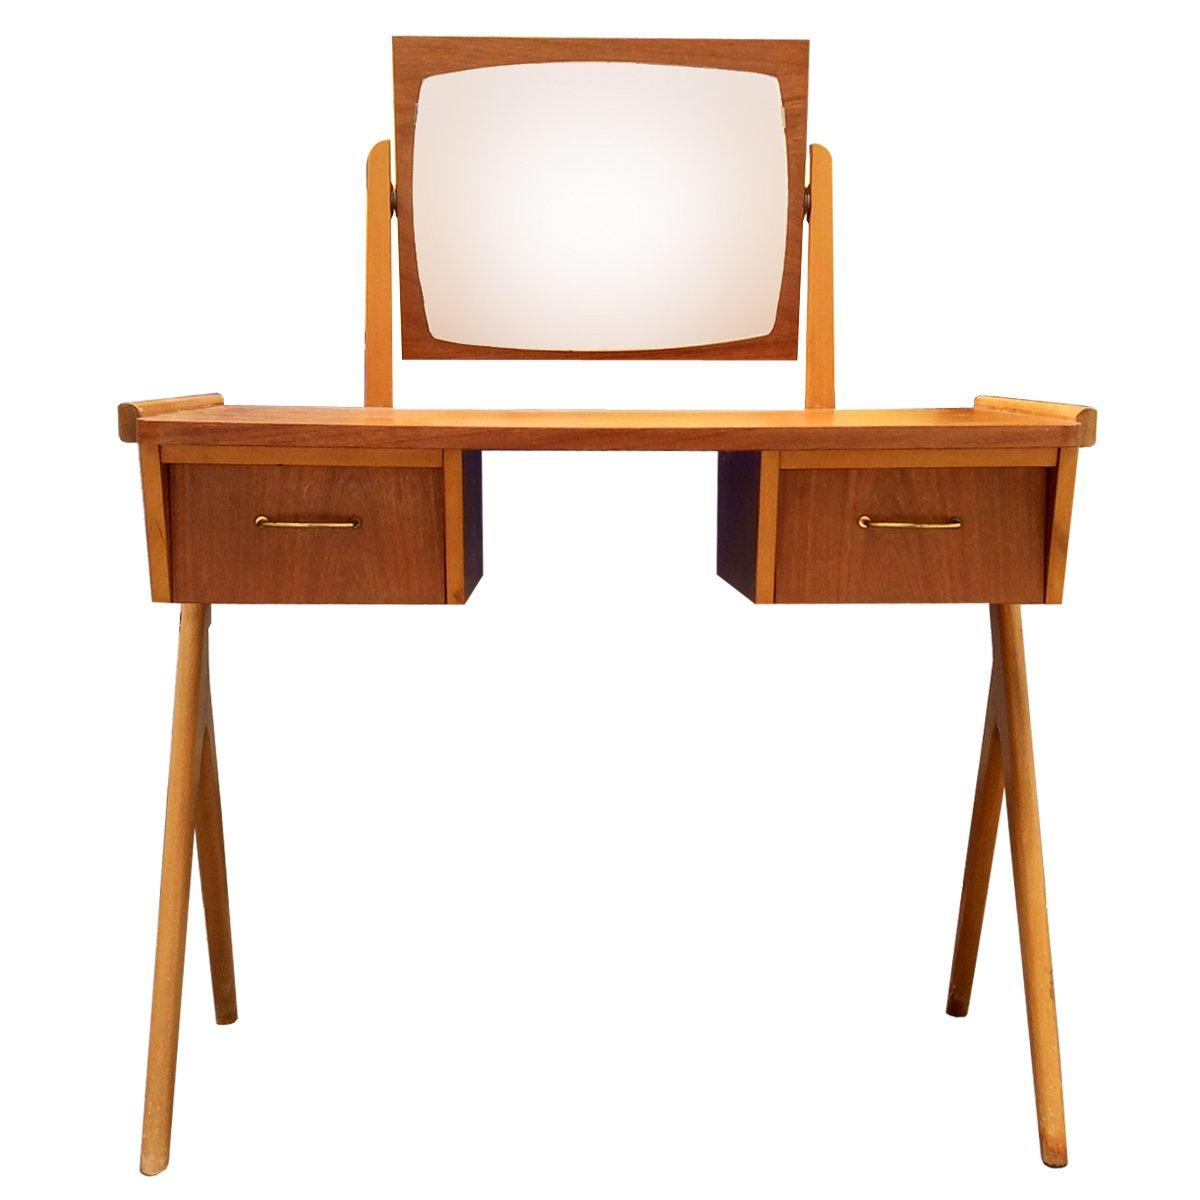 Scandinavian teak dressing table 1960s for sale at pamono for Dressing table 85cm